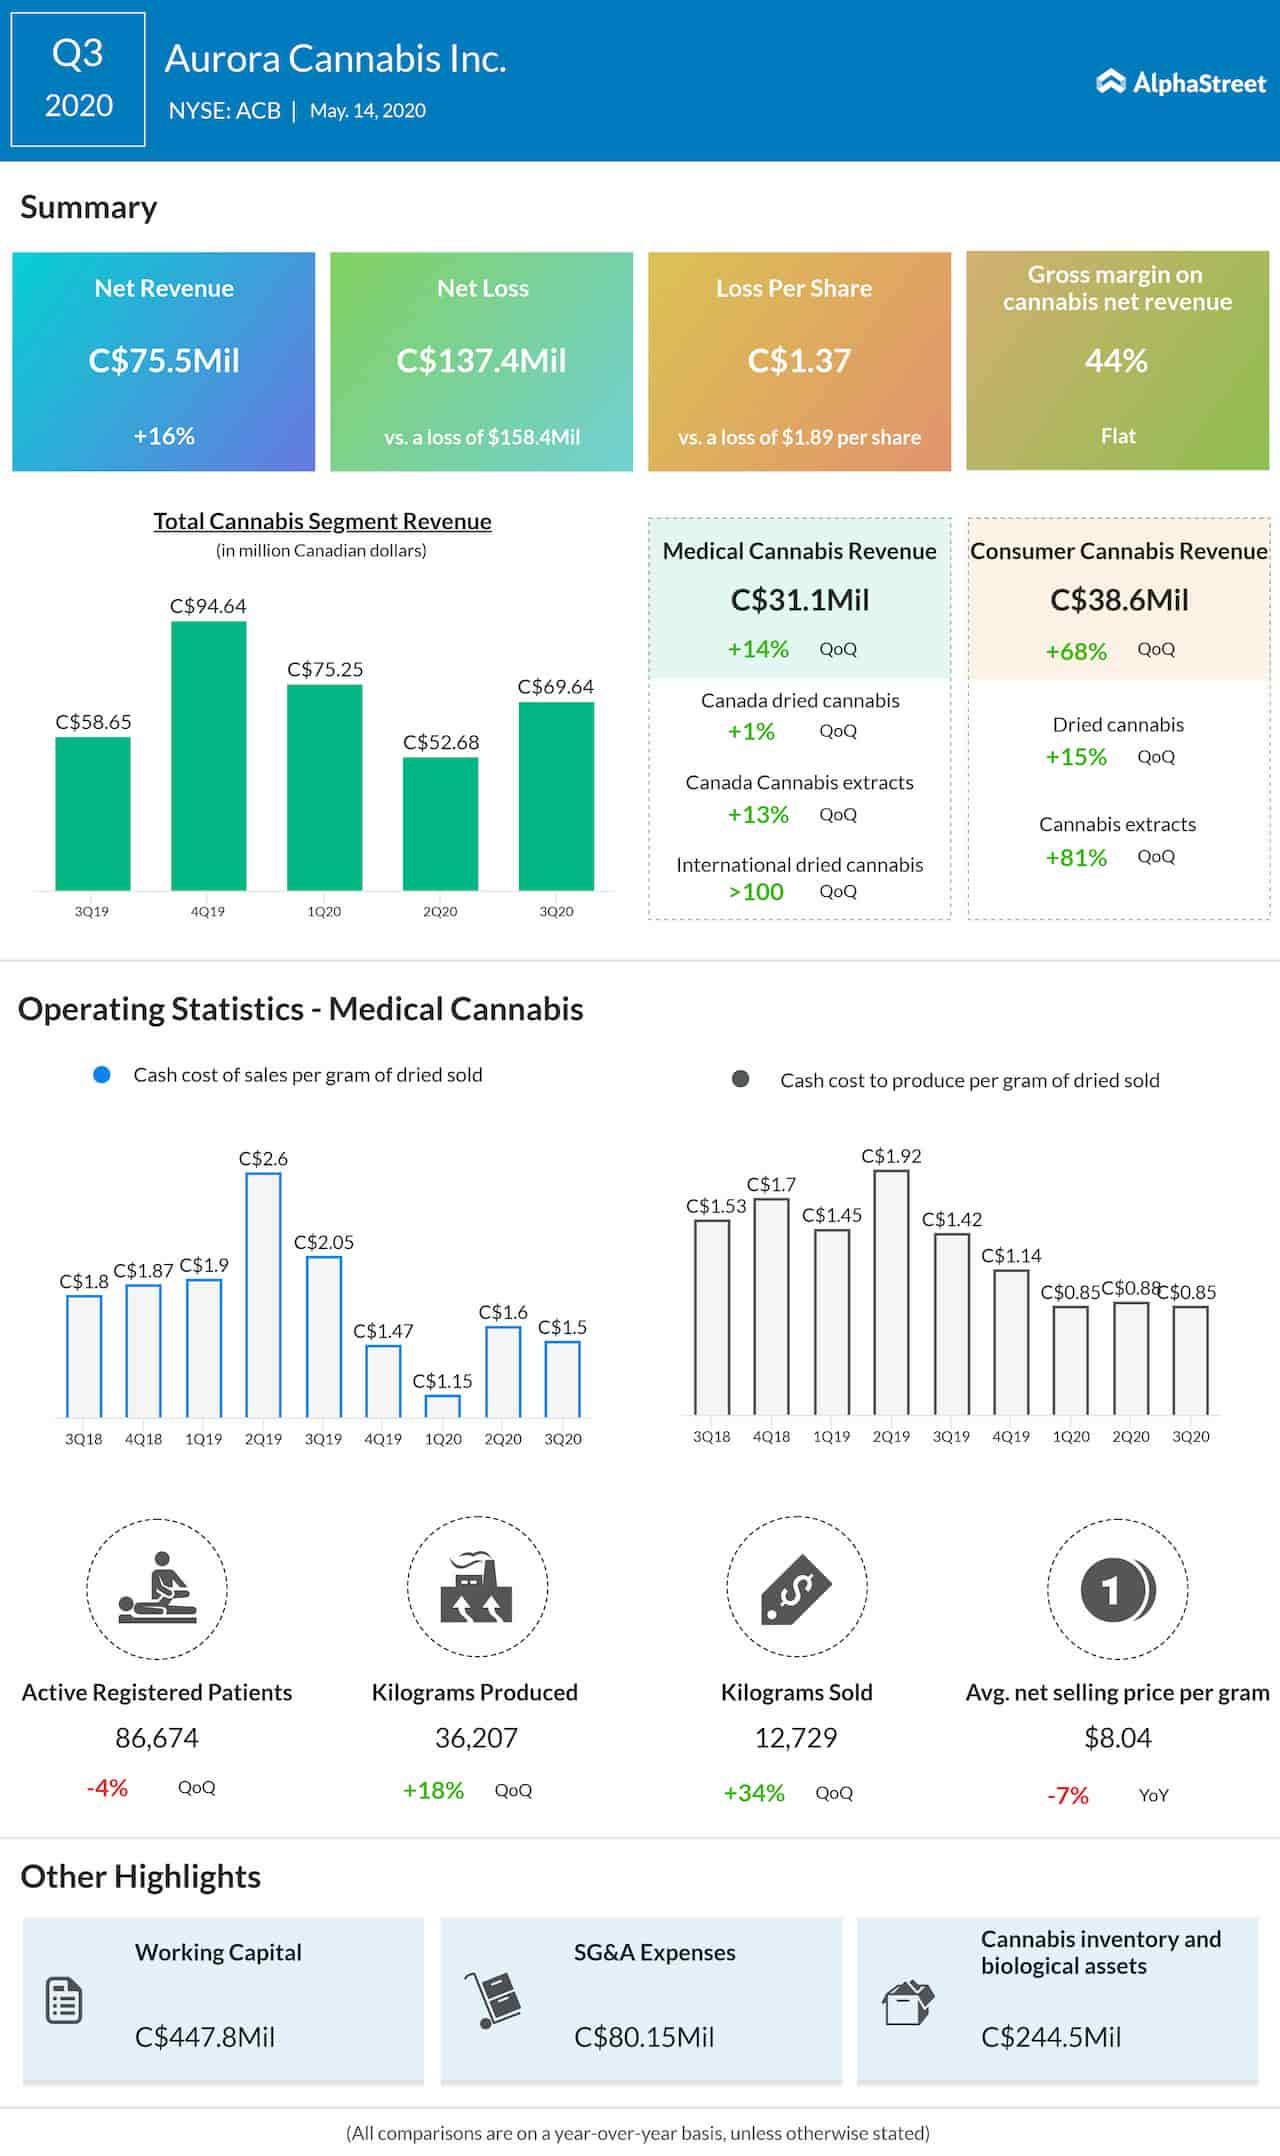 Aurora Cannabis Q3 2020 Earnings Infographic